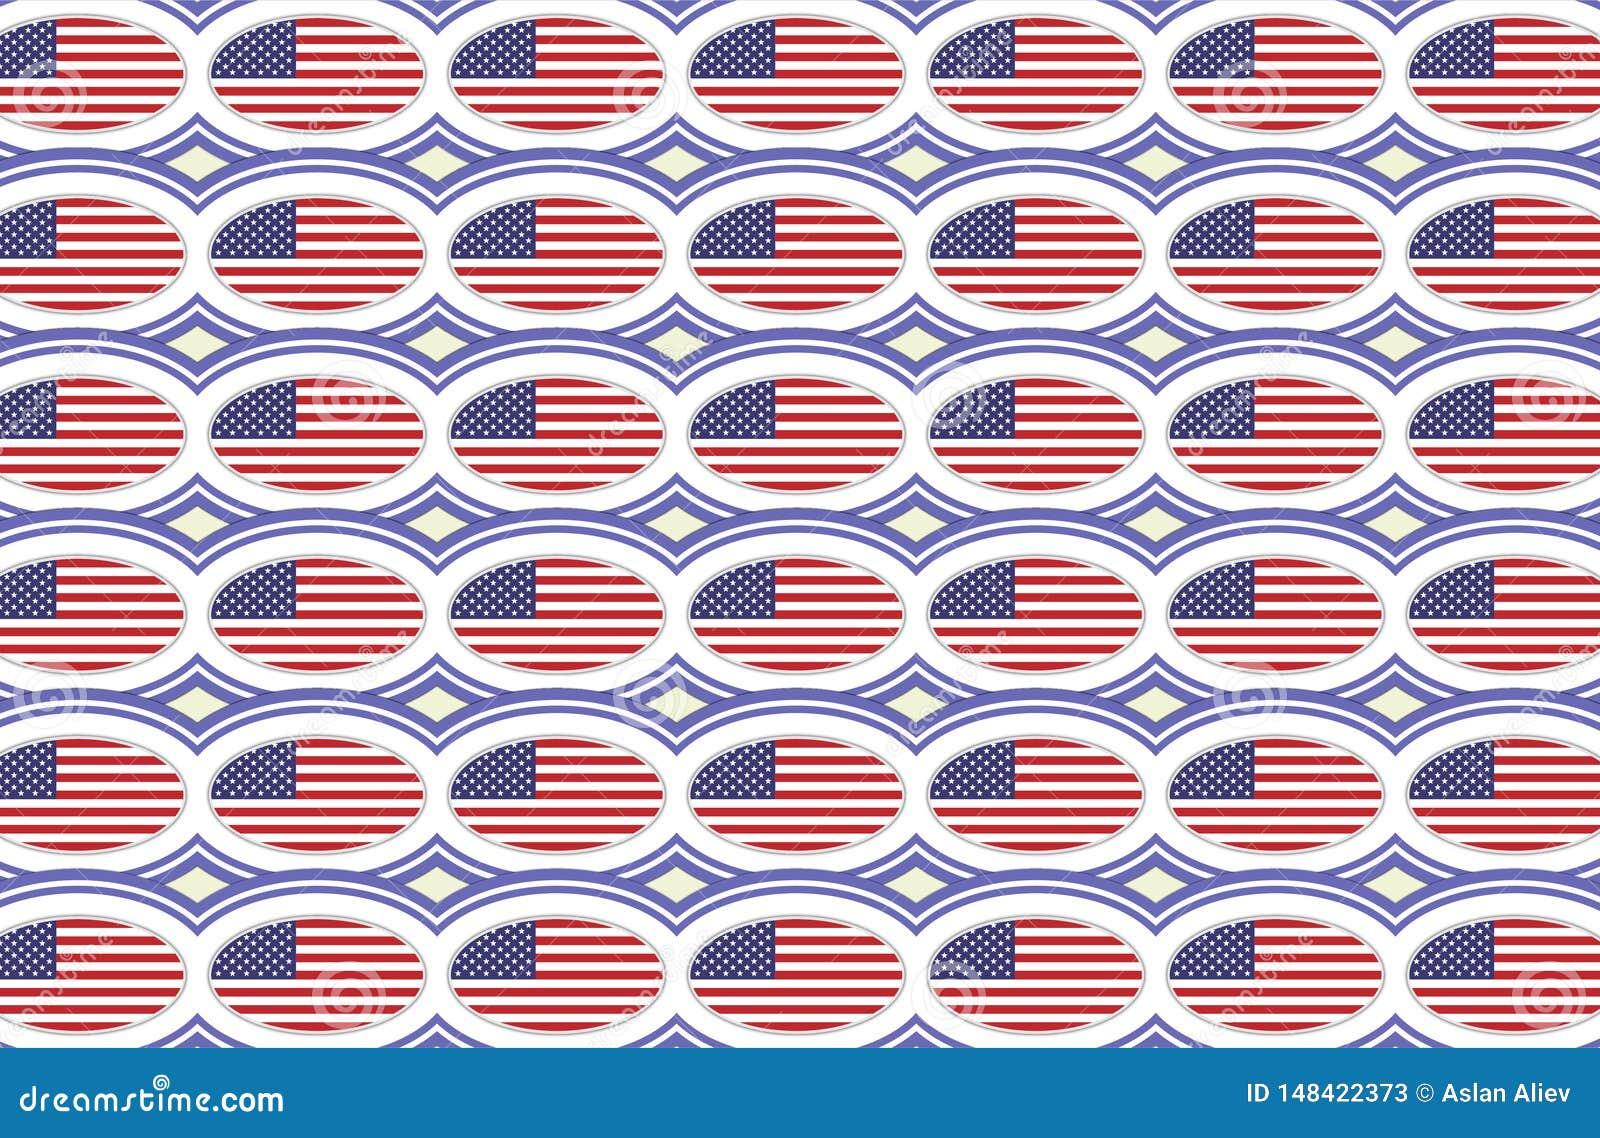 Картина американского флага